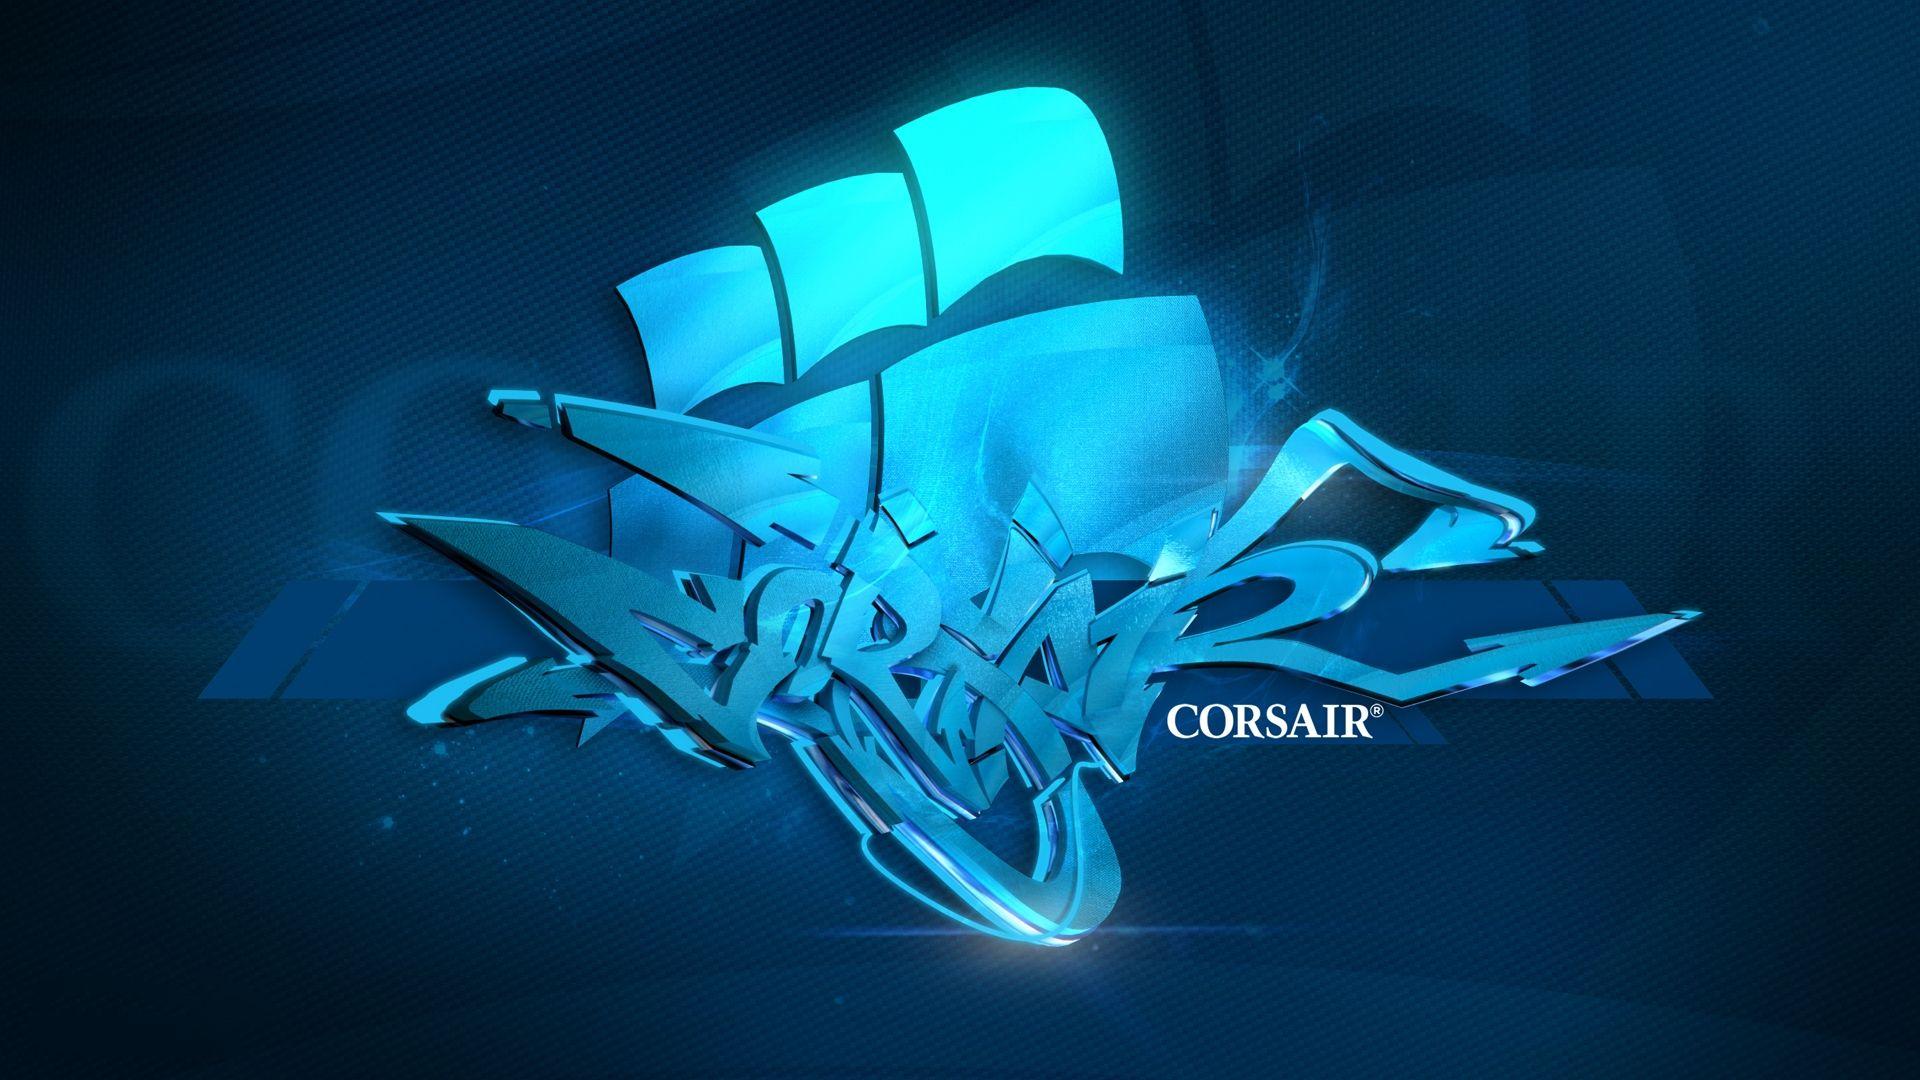 corsair hd desktop wallpapers